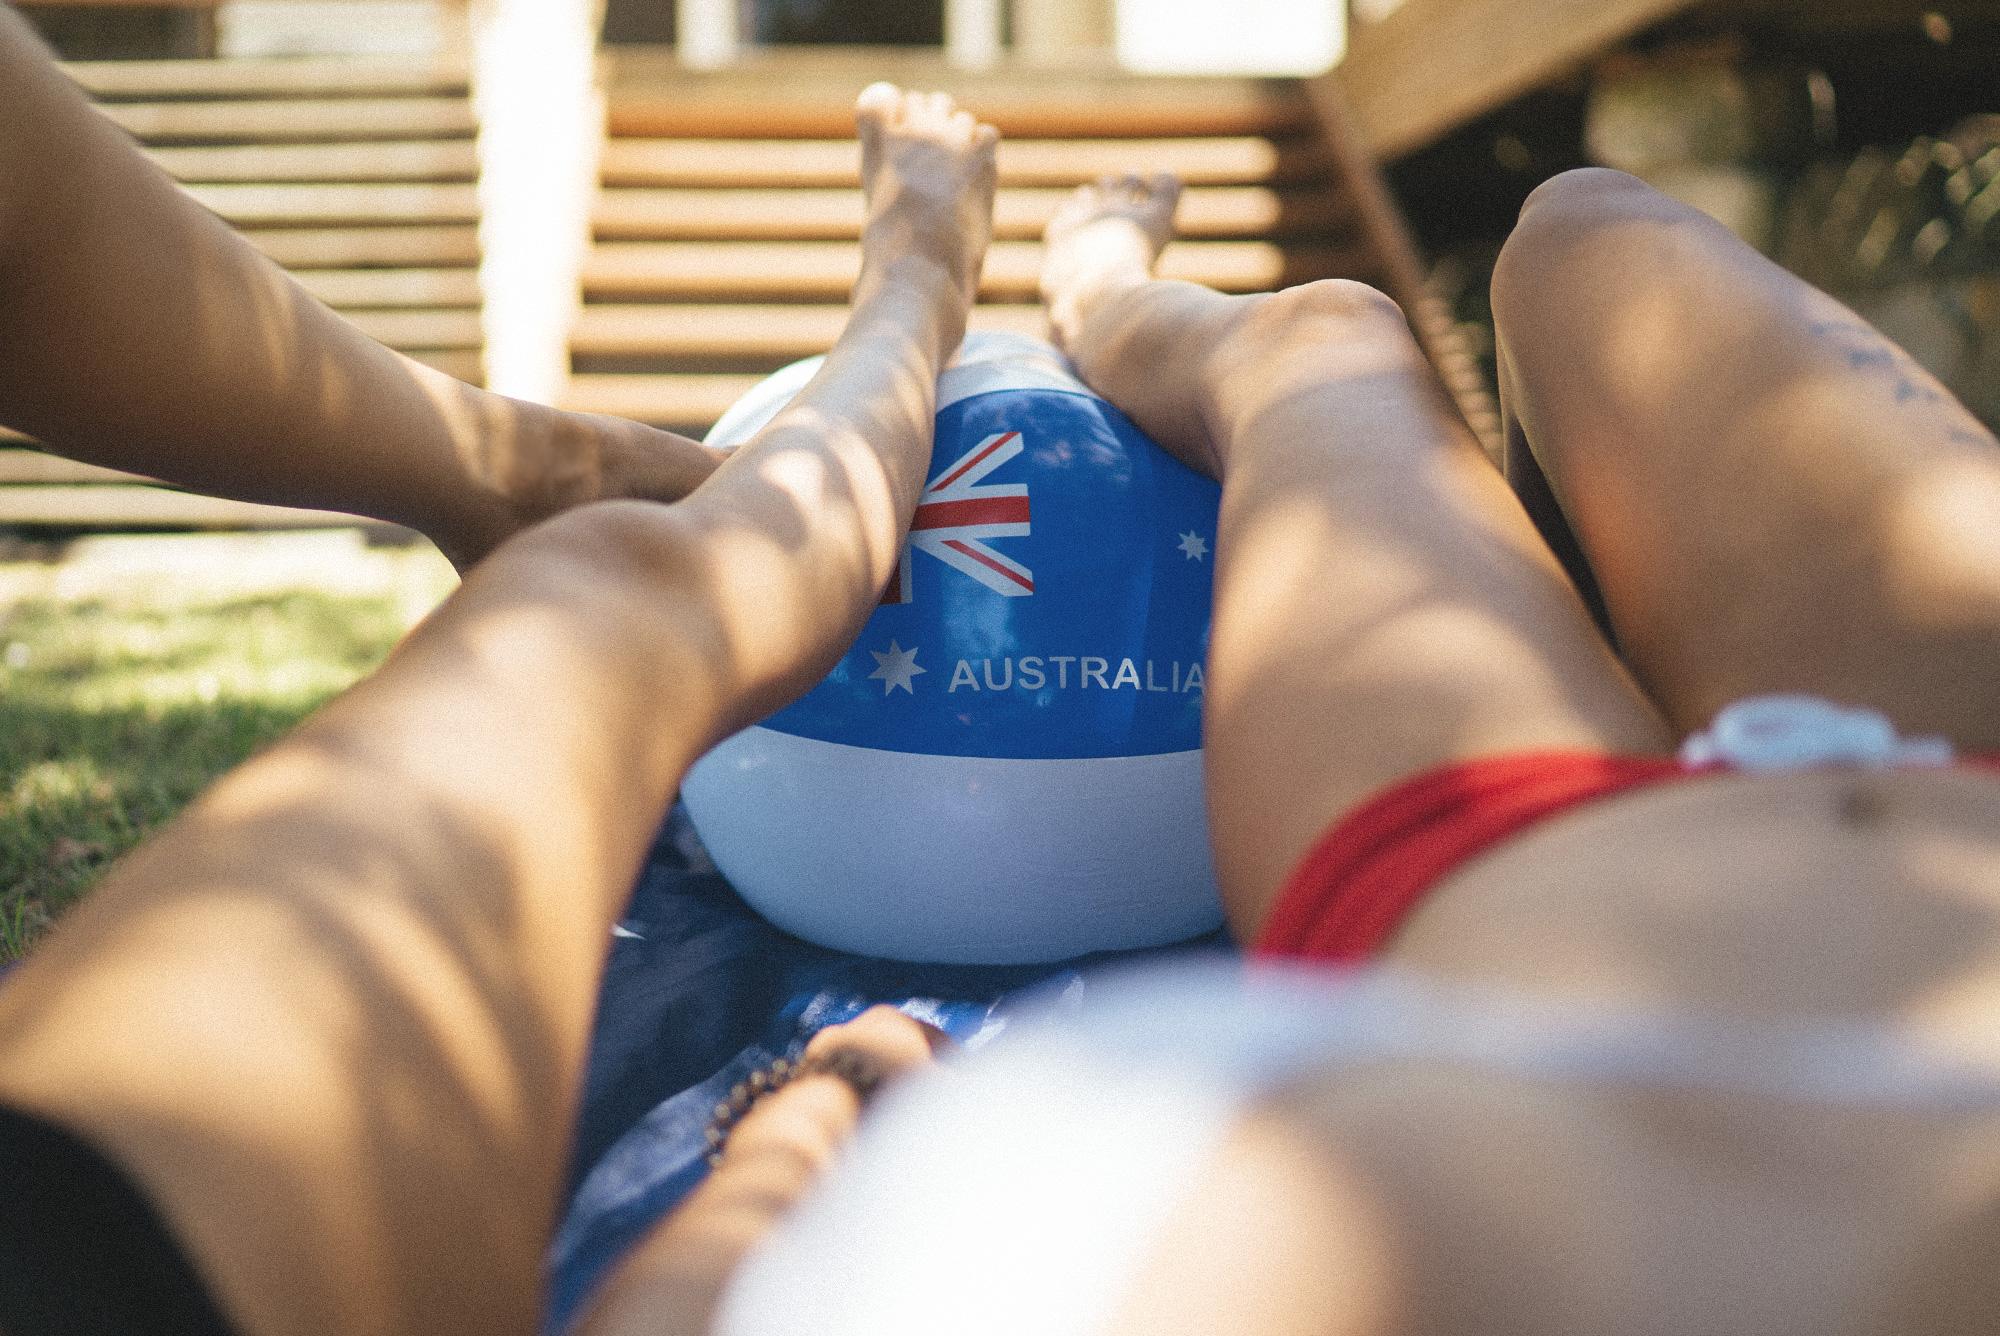 australiaday_babes_garden_shoot_justinfox_legs